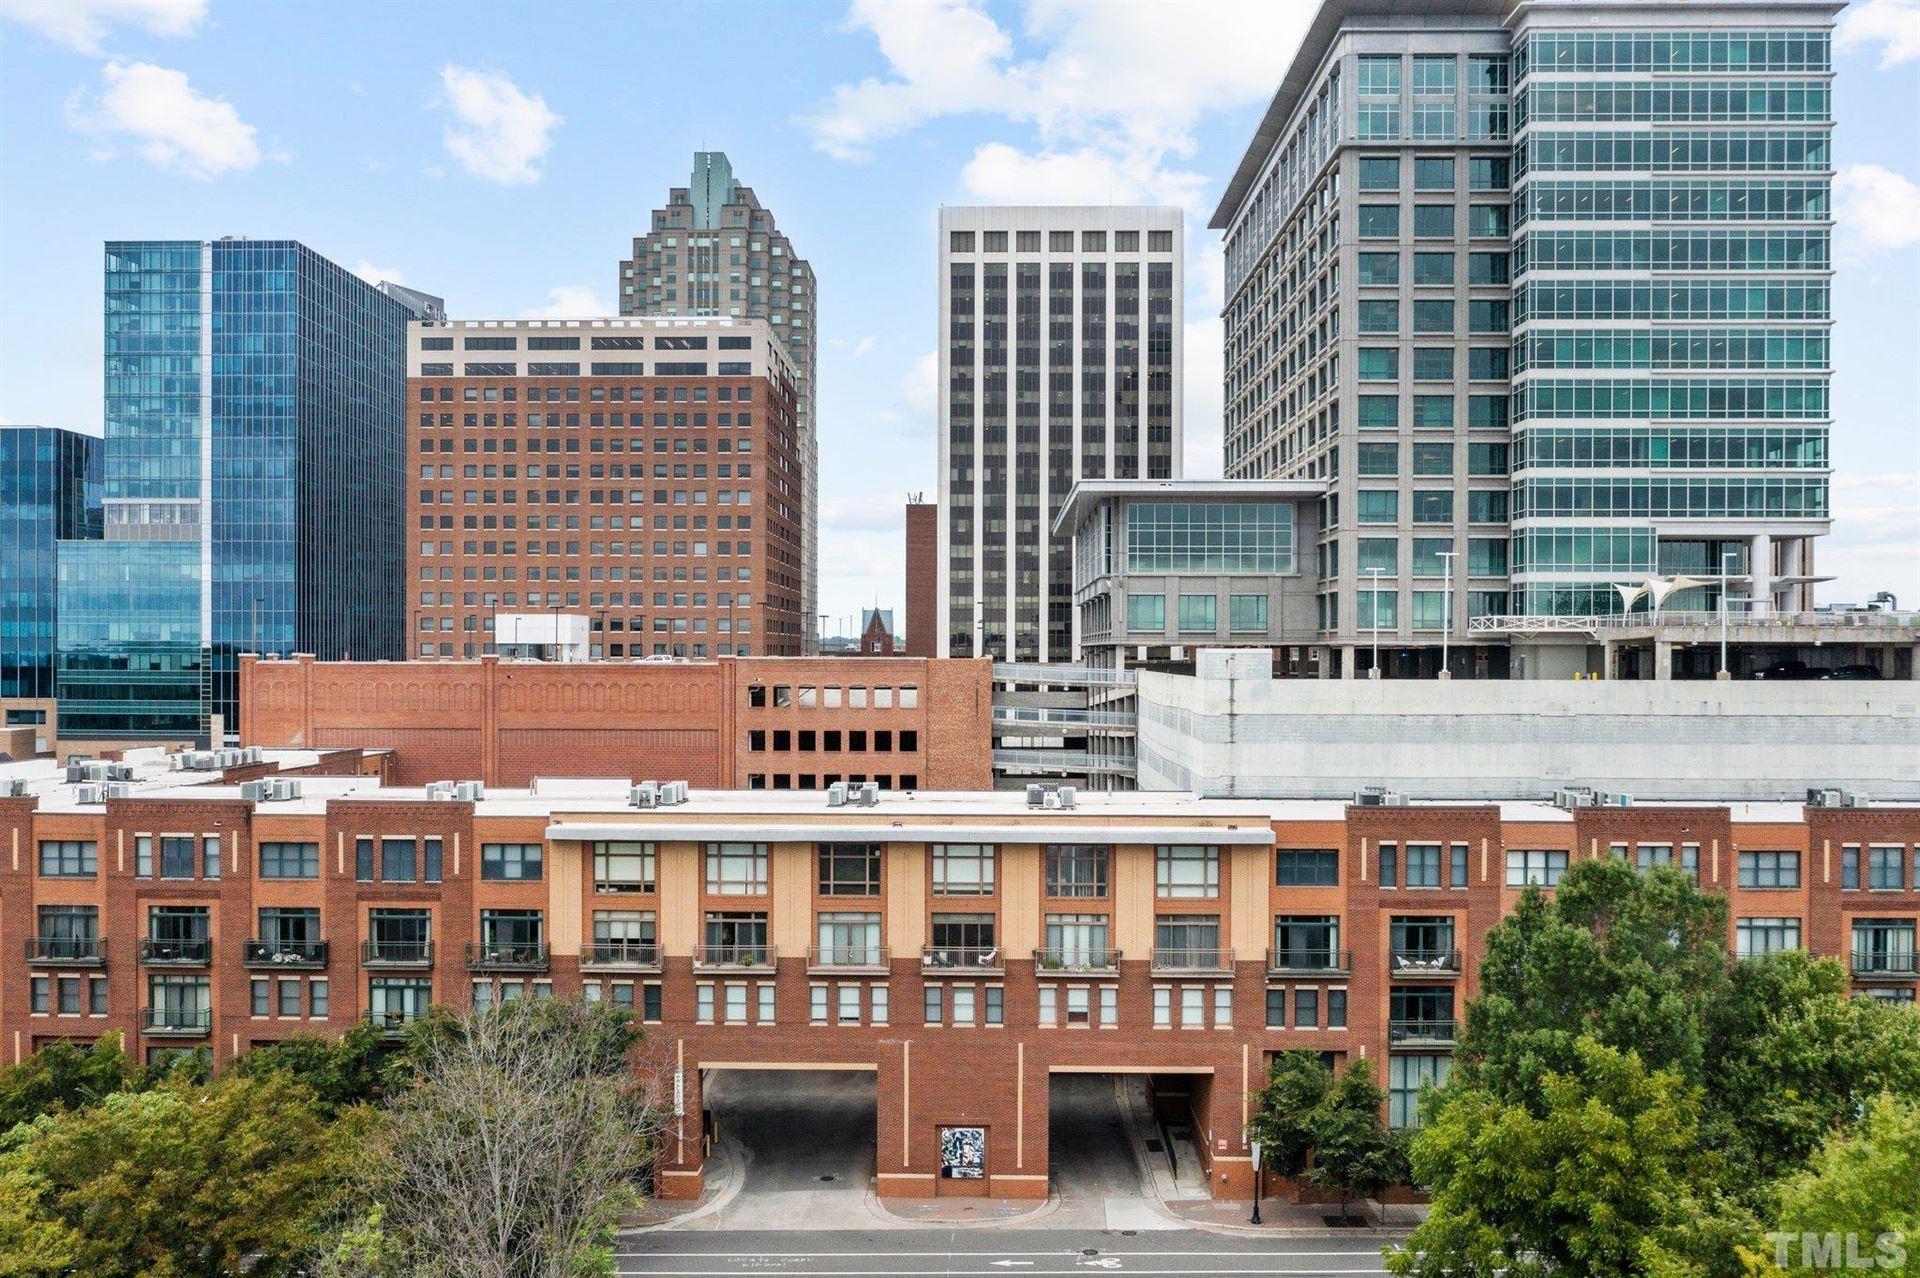 Photo of 444 S Blount Street #309, Raleigh, NC 27601 (MLS # 2408754)